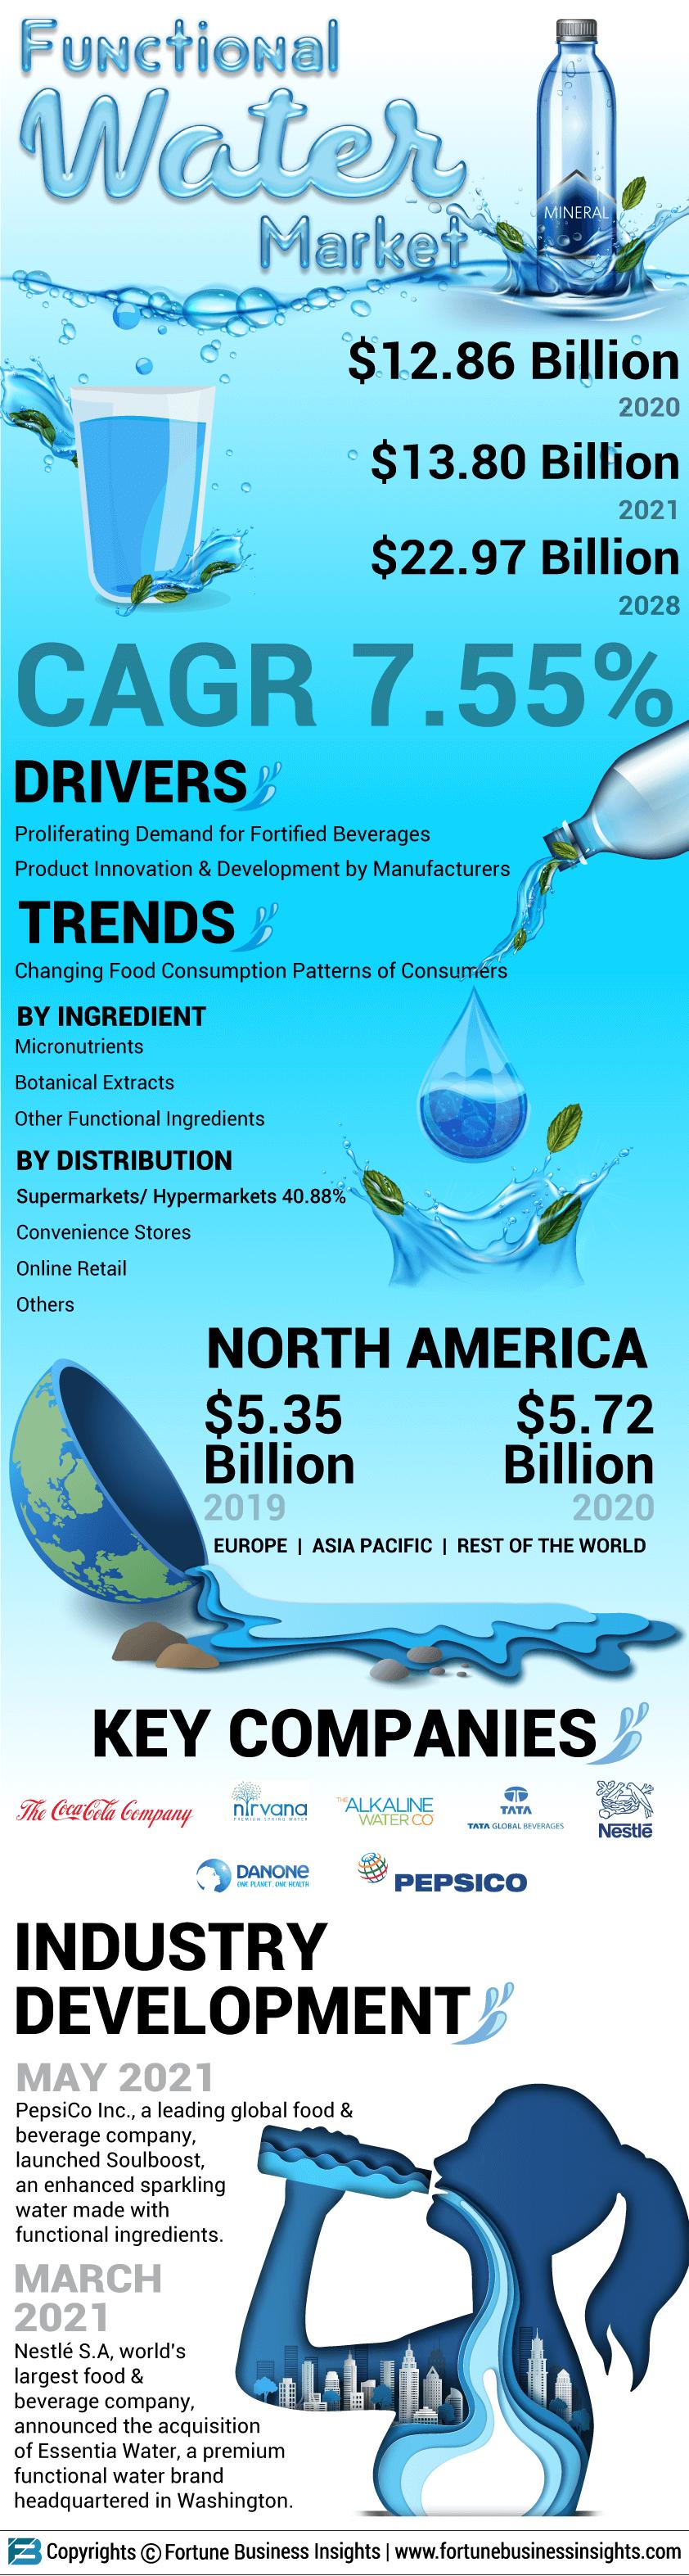 Functional Water Market